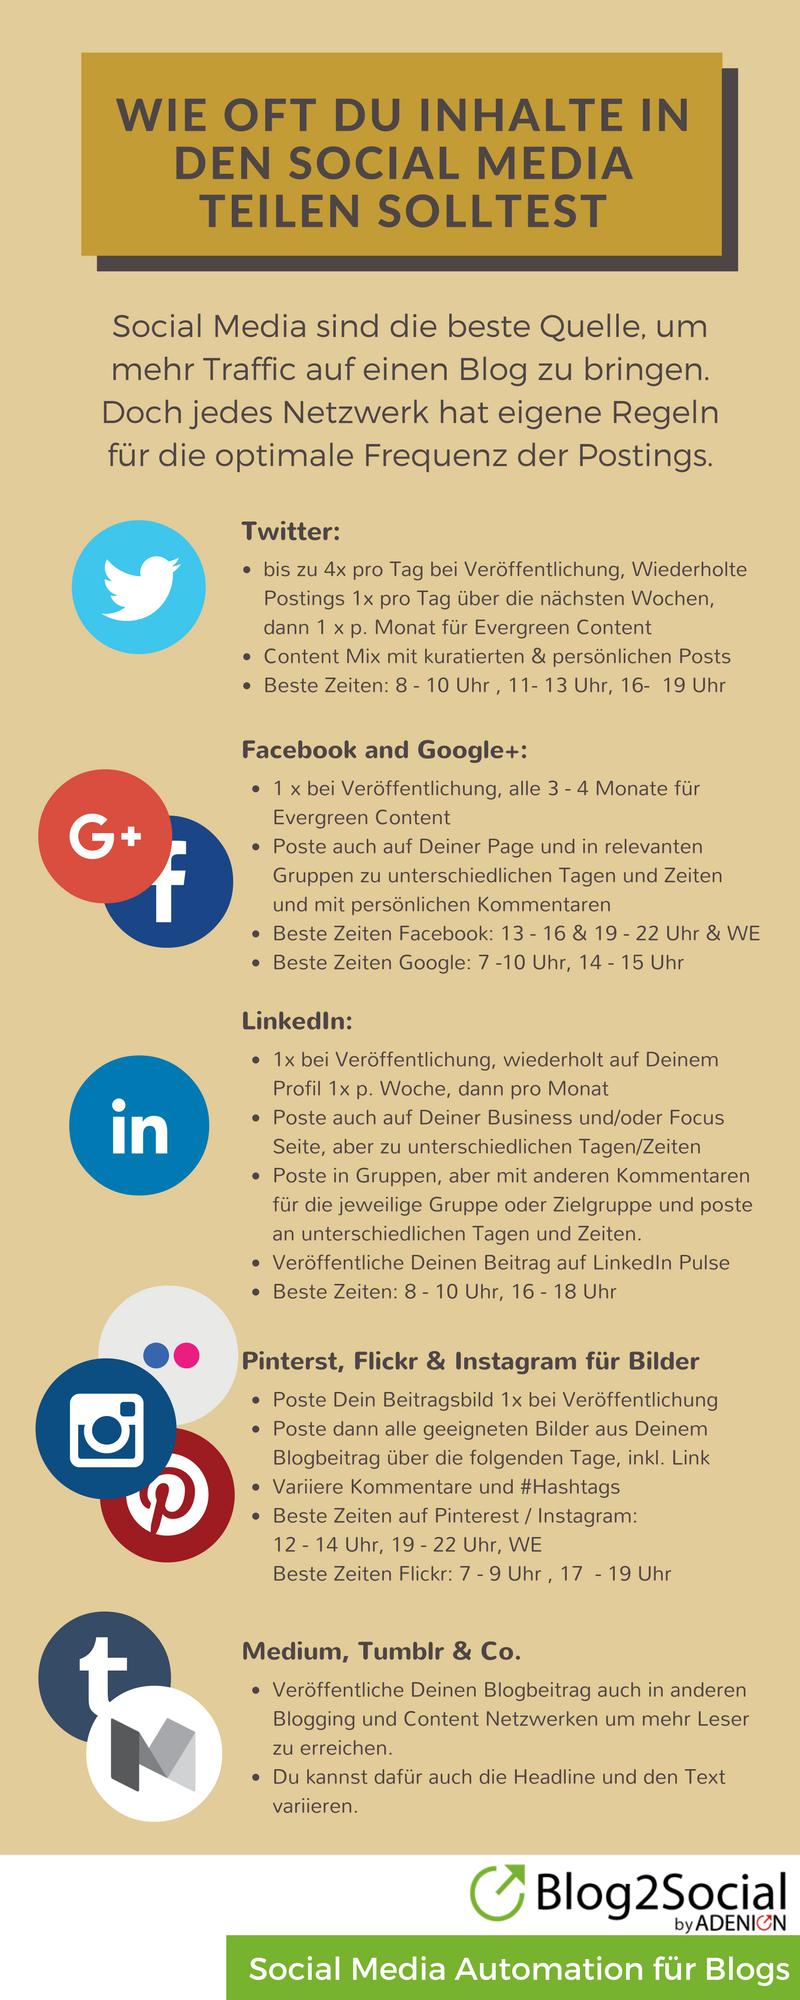 Wie oft du in den Social Media teilen solltest